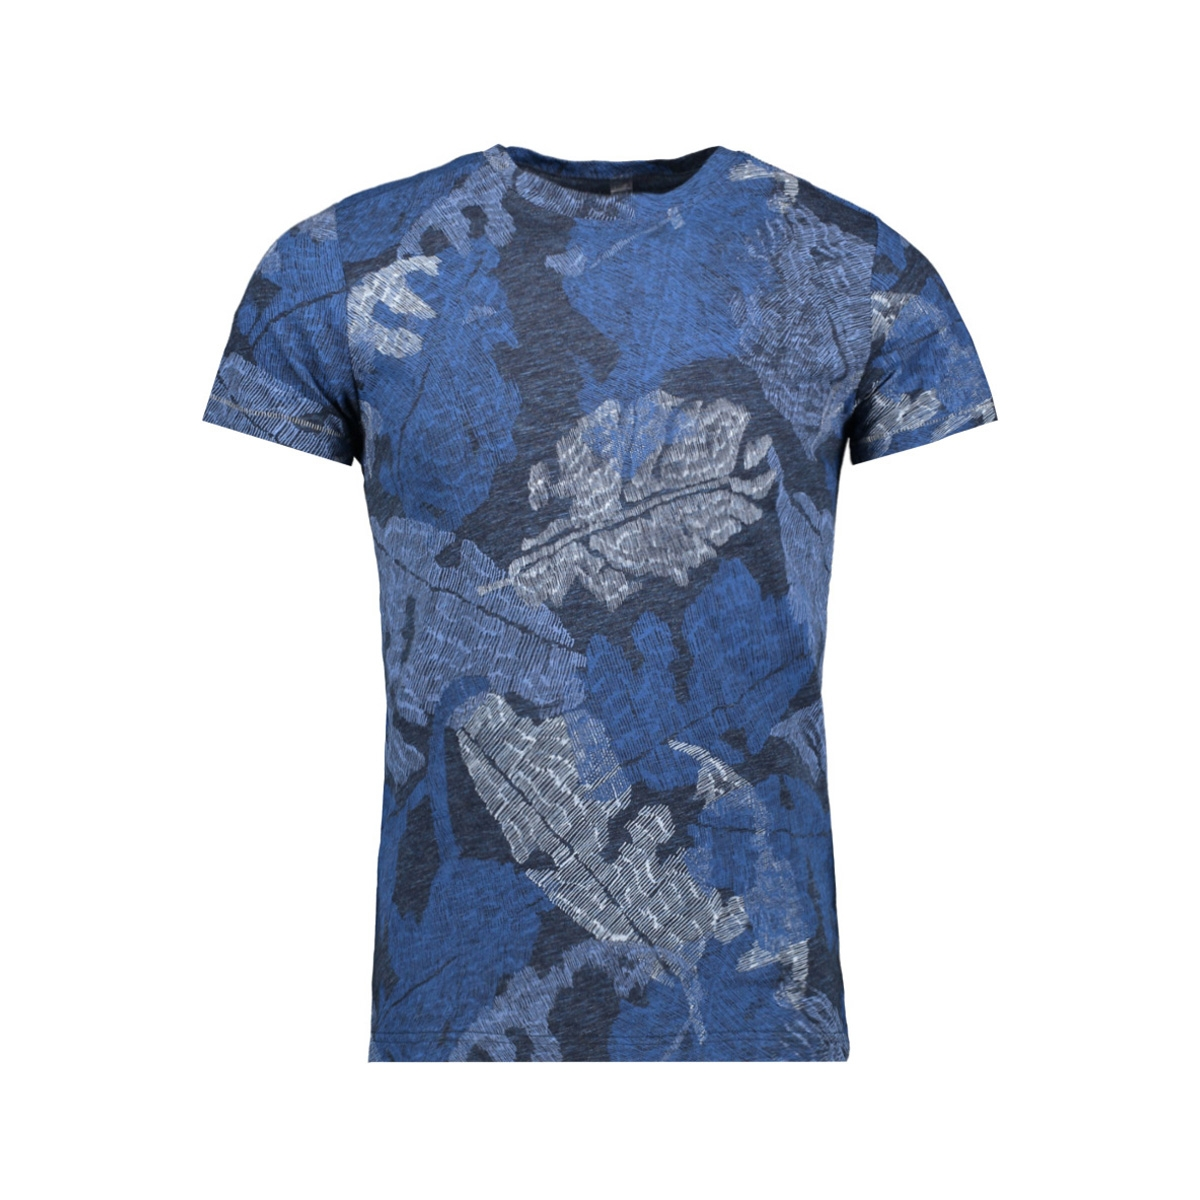 sketched rubberplant print t shirt ctss194302 cast iron t-shirt 5307